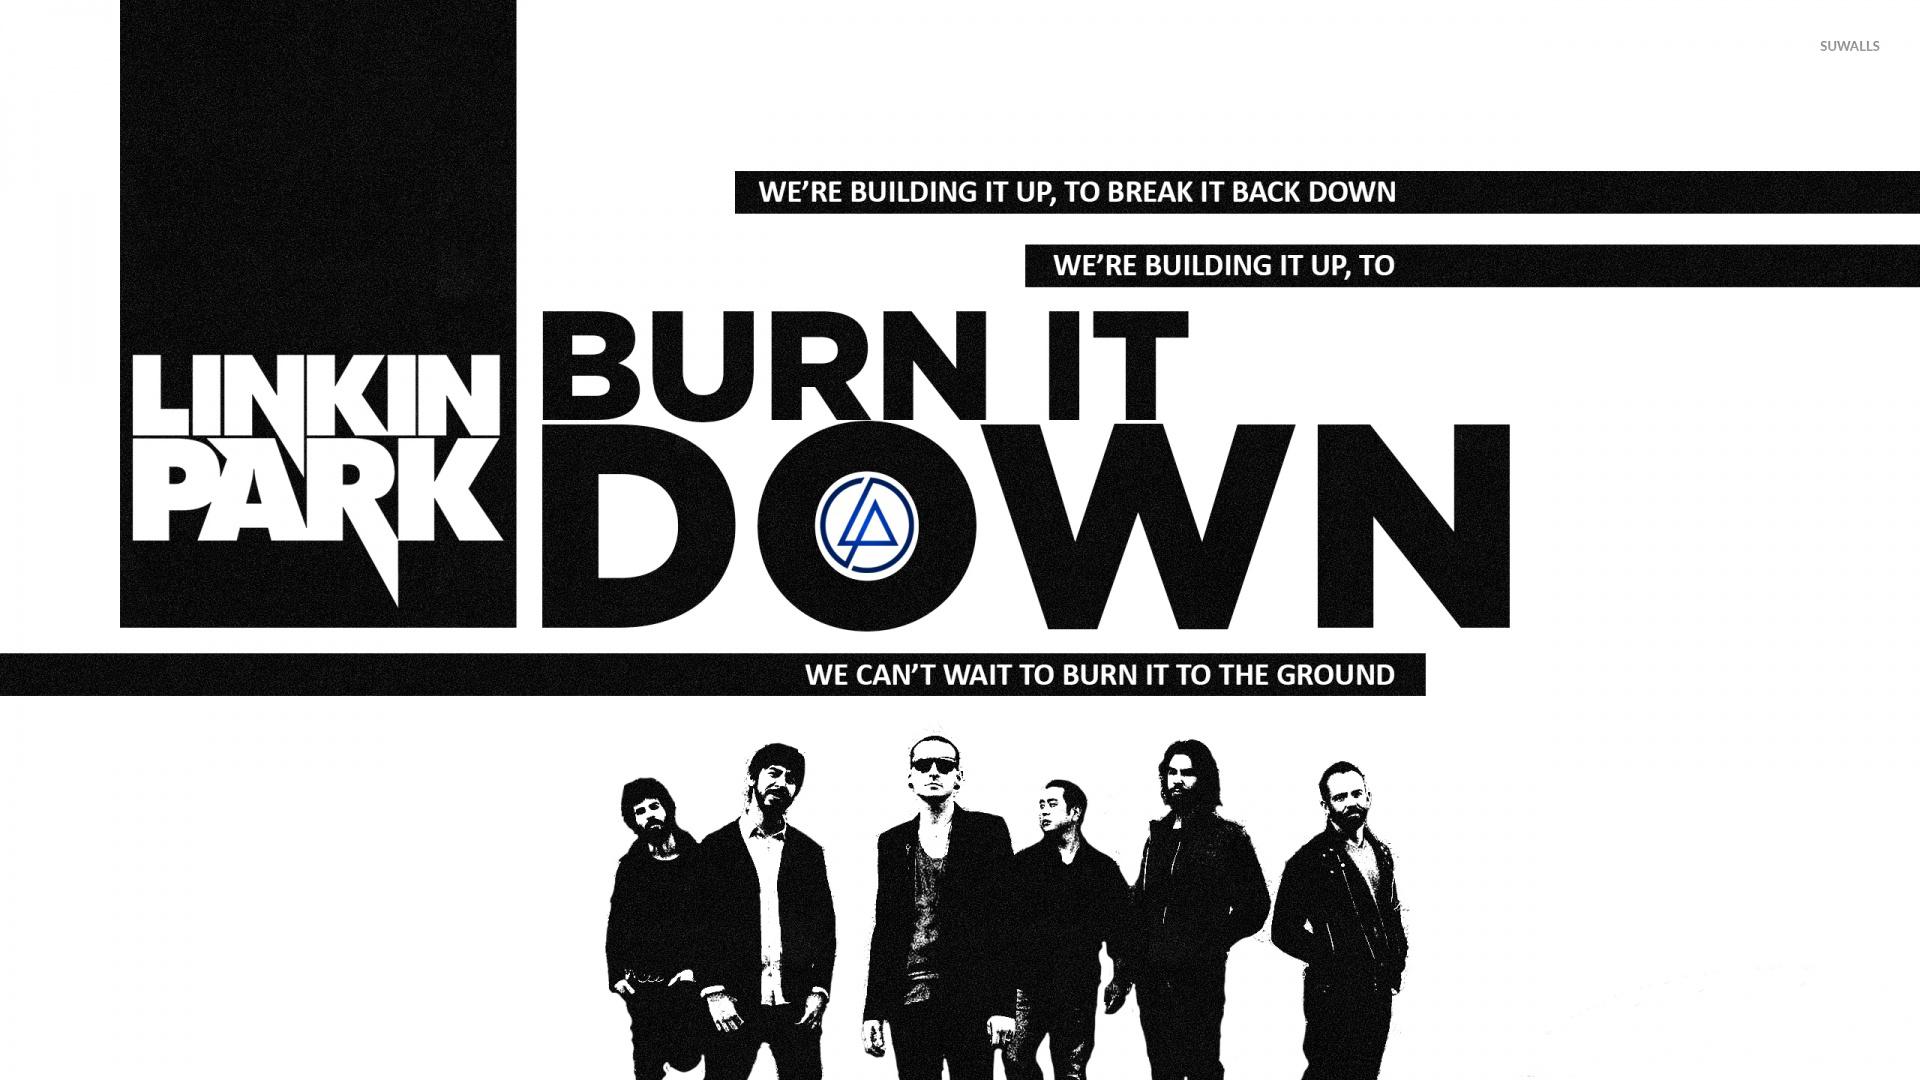 Burn It Down Linkin Park Wallpaper Music Wallpapers 52391